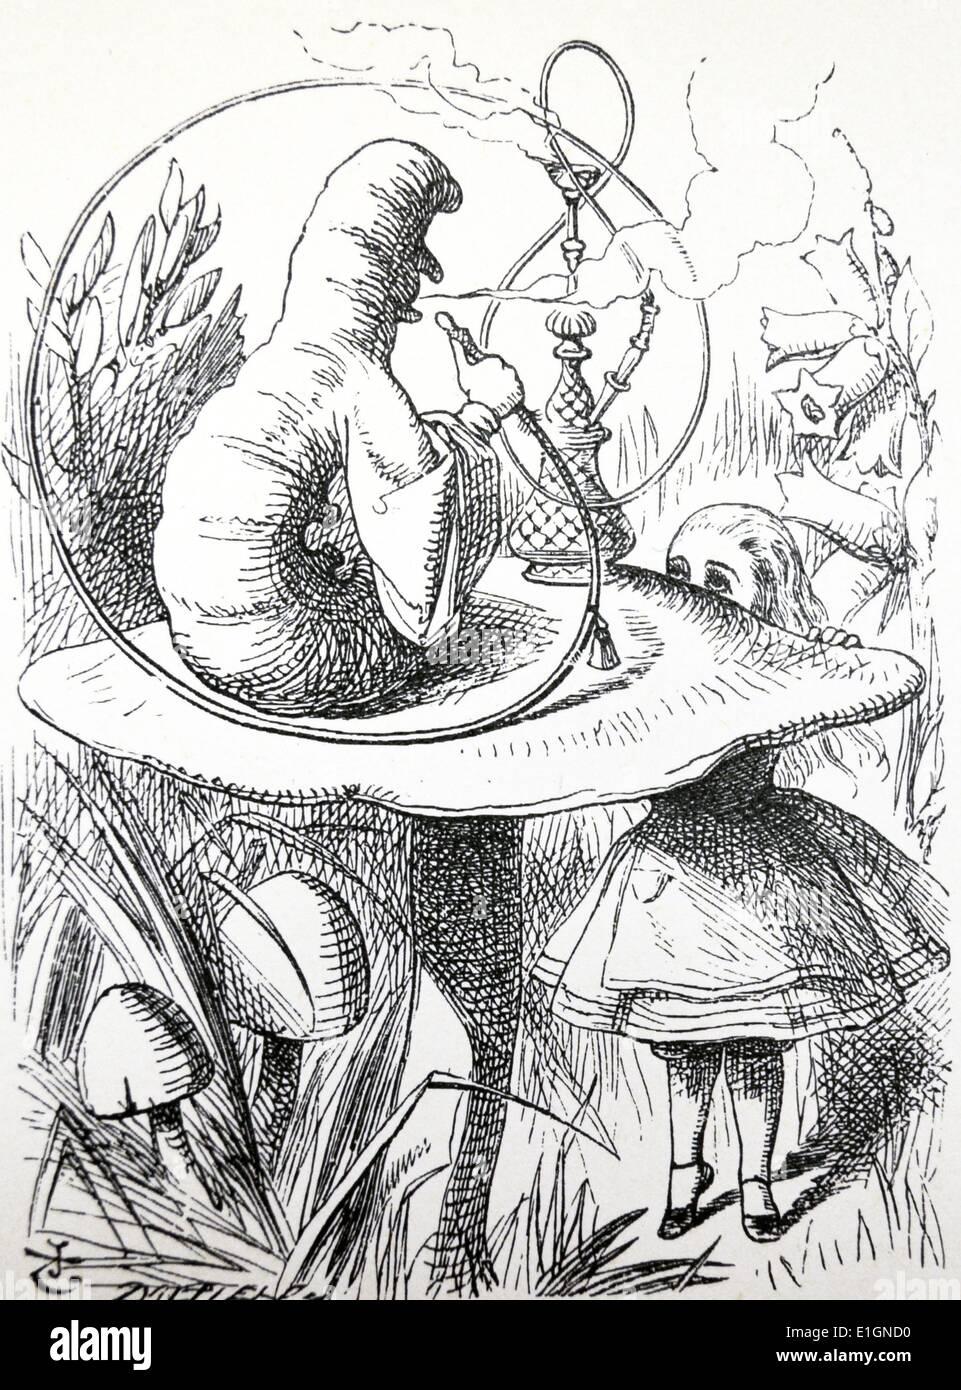 Alice's Adventures in Wonderland Photo Stock